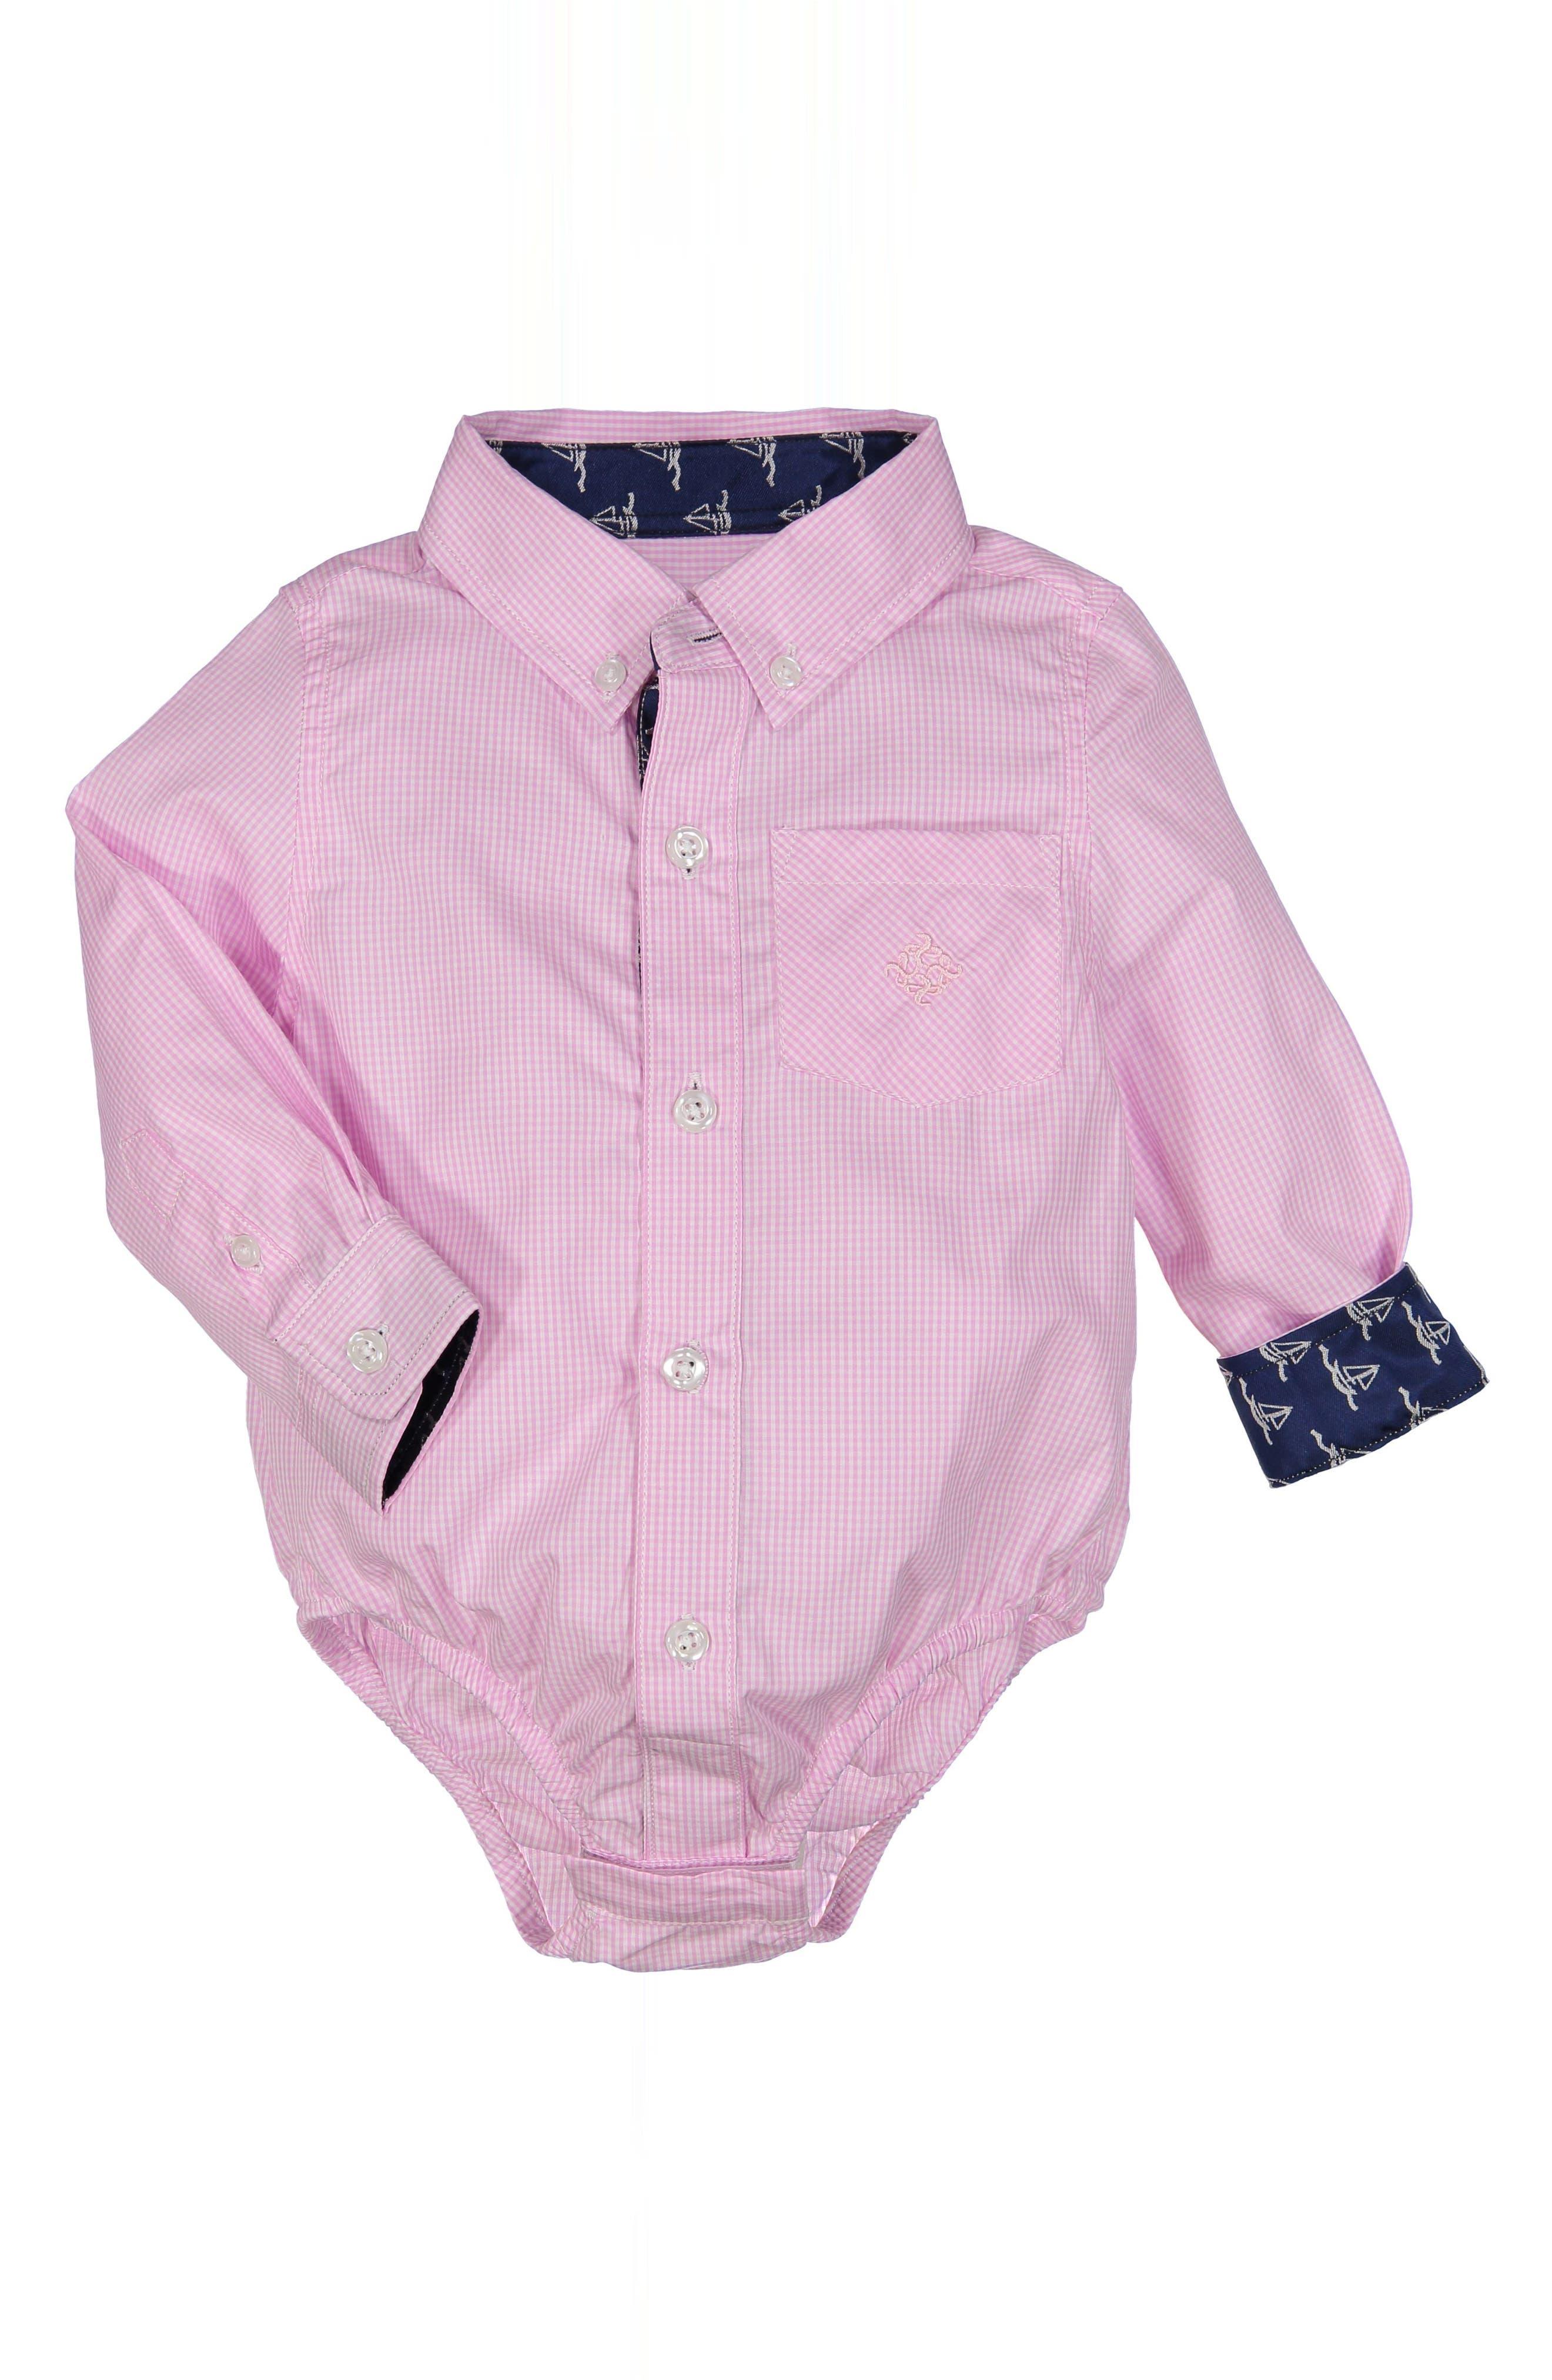 Shirtzie Microcheck Bodysuit,                             Main thumbnail 1, color,                             688